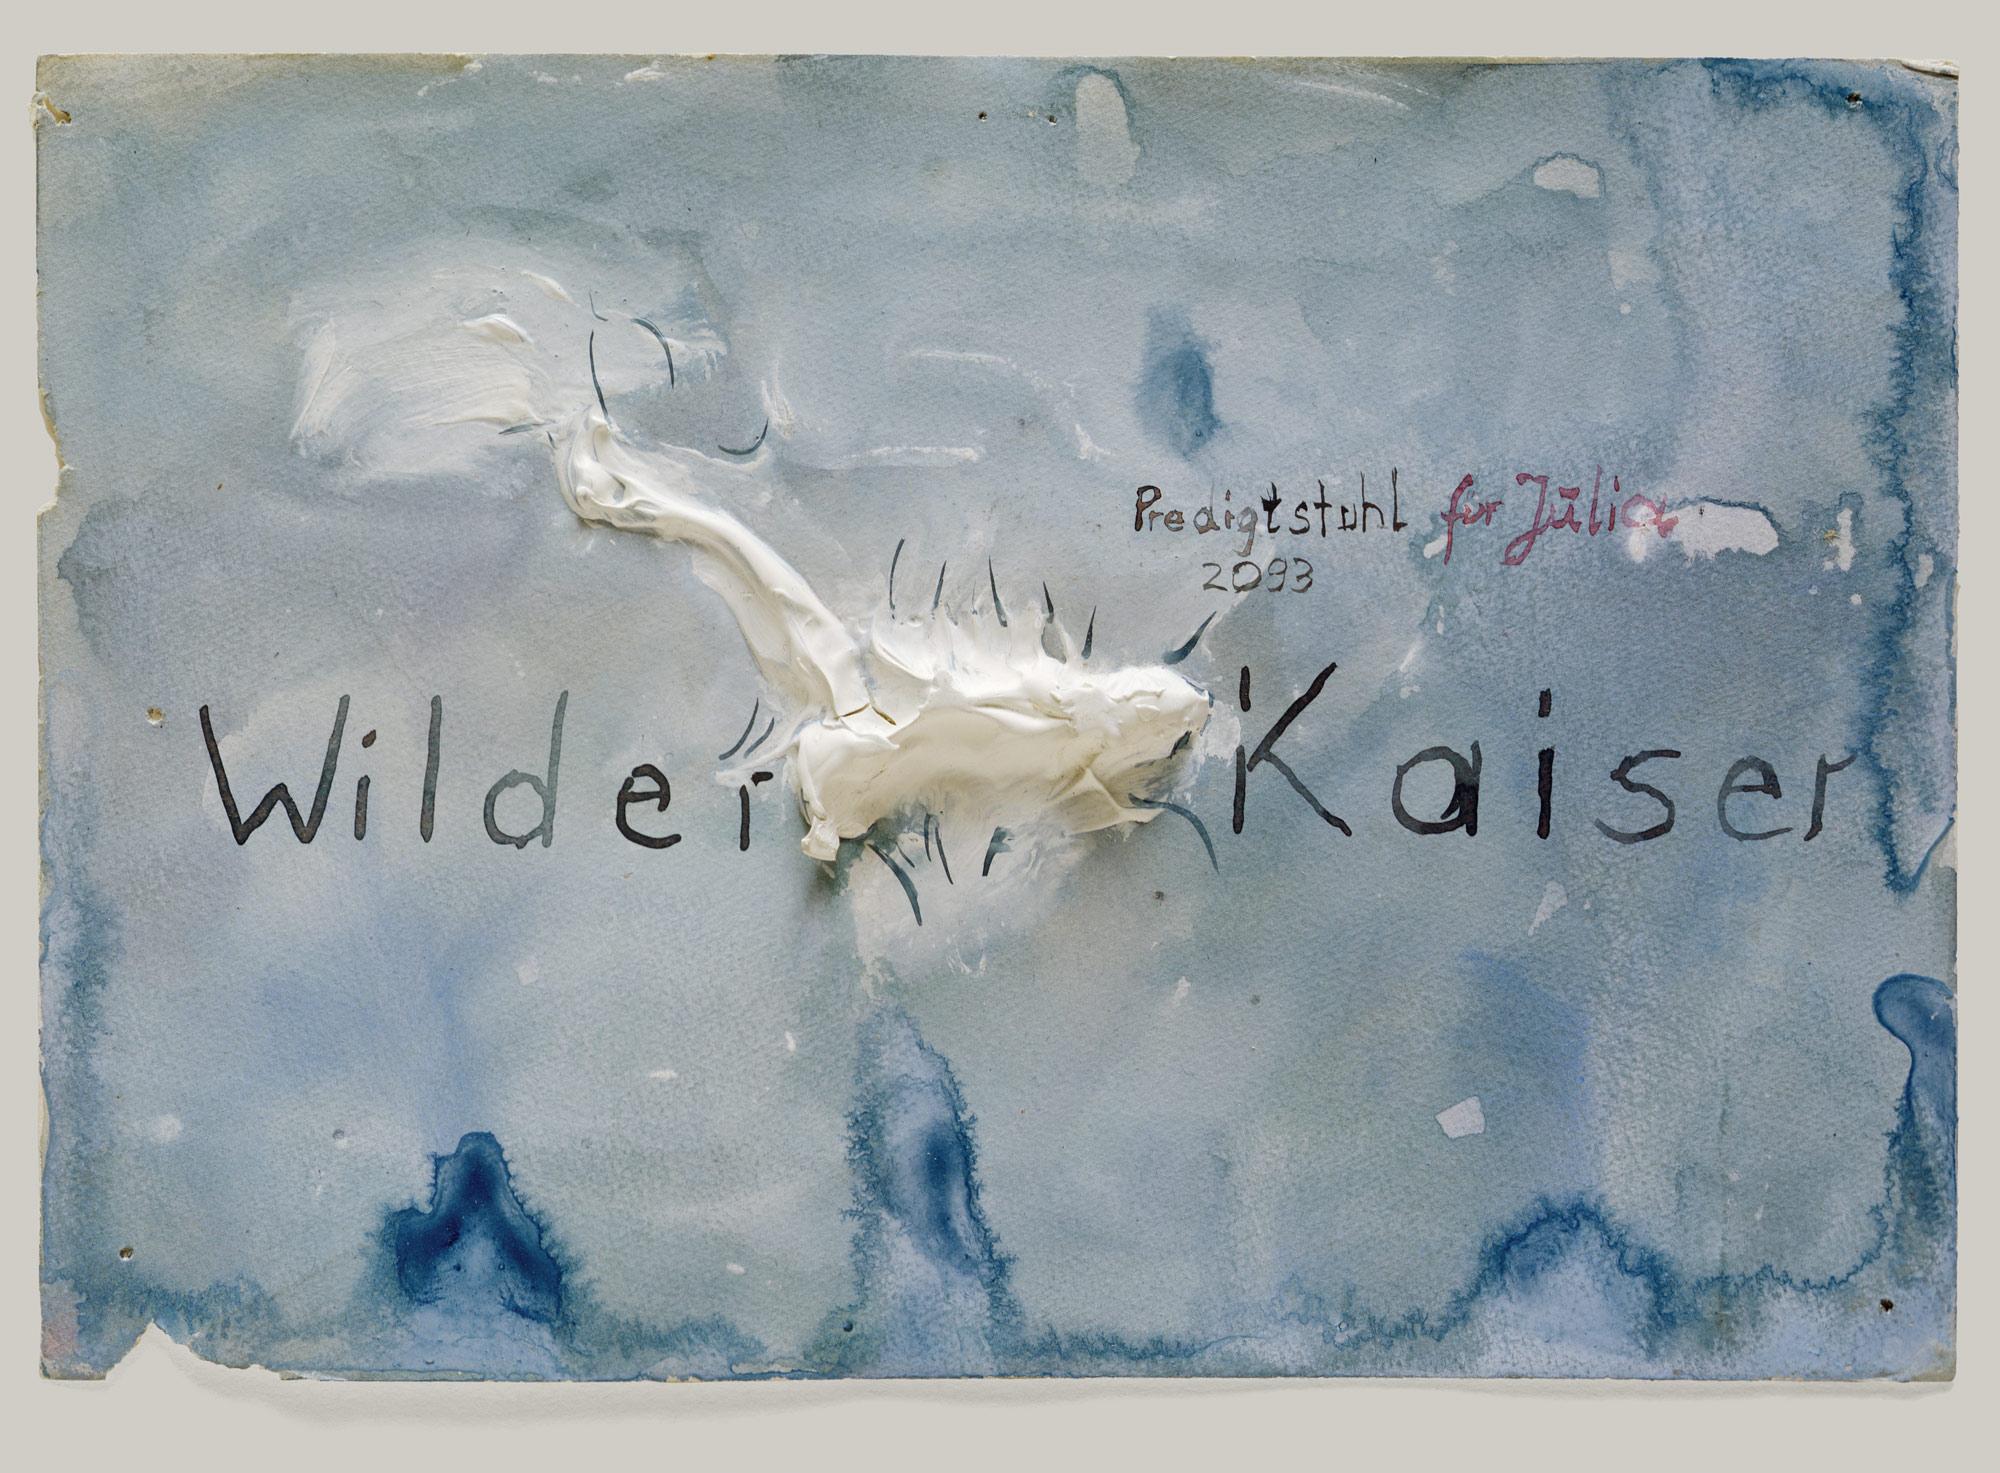 Modern Materials: Plastics | Essay | Heilbrunn Timeline of Art ...